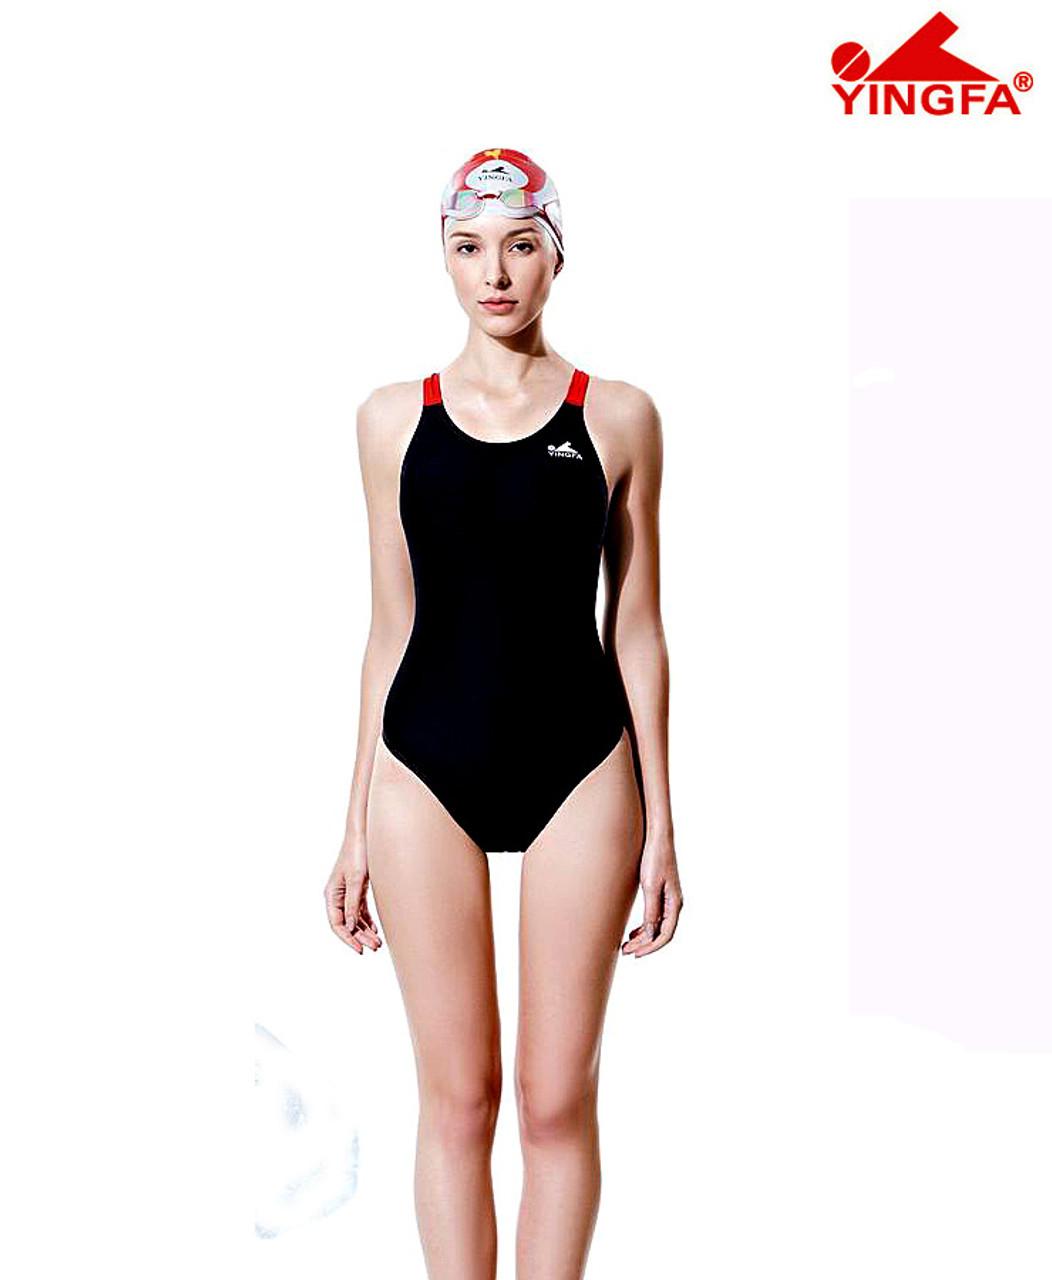 d6840abde5 Yingfa YF613-1 Women's PBT Swimsuits - Black/Red